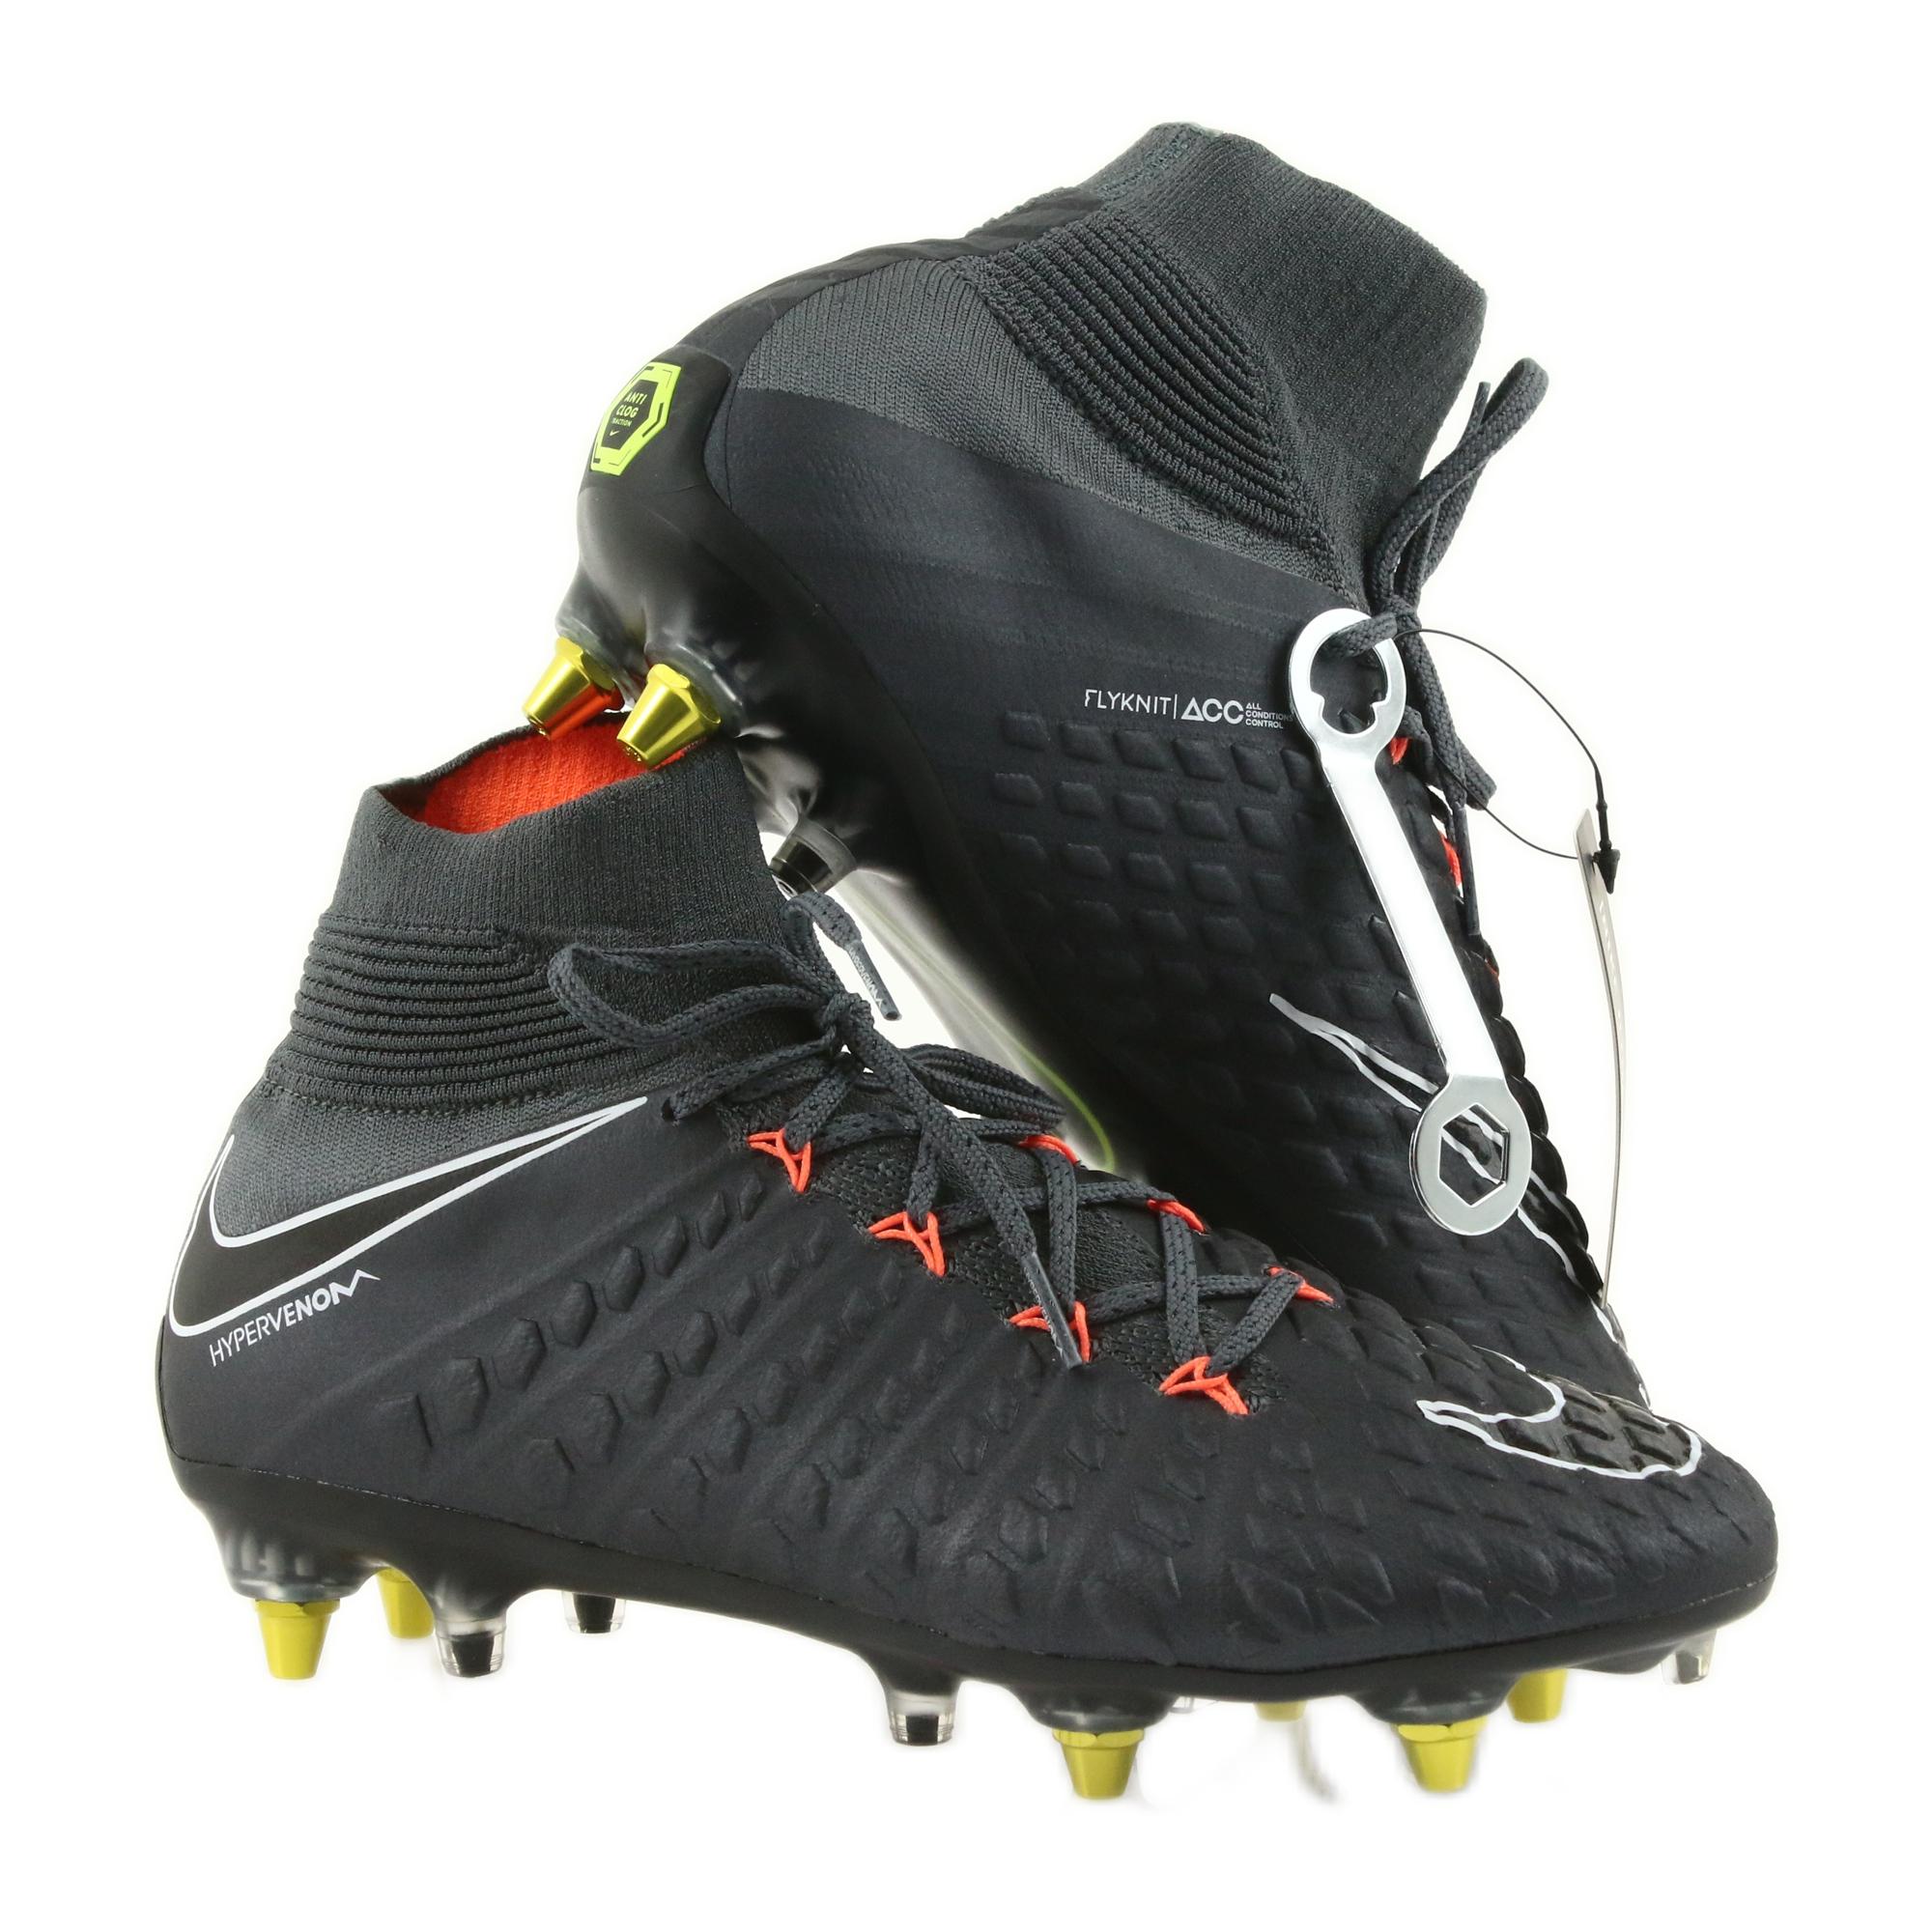 new product 382d6 1266e Football shoes Nike Hypervenom Phantom 3